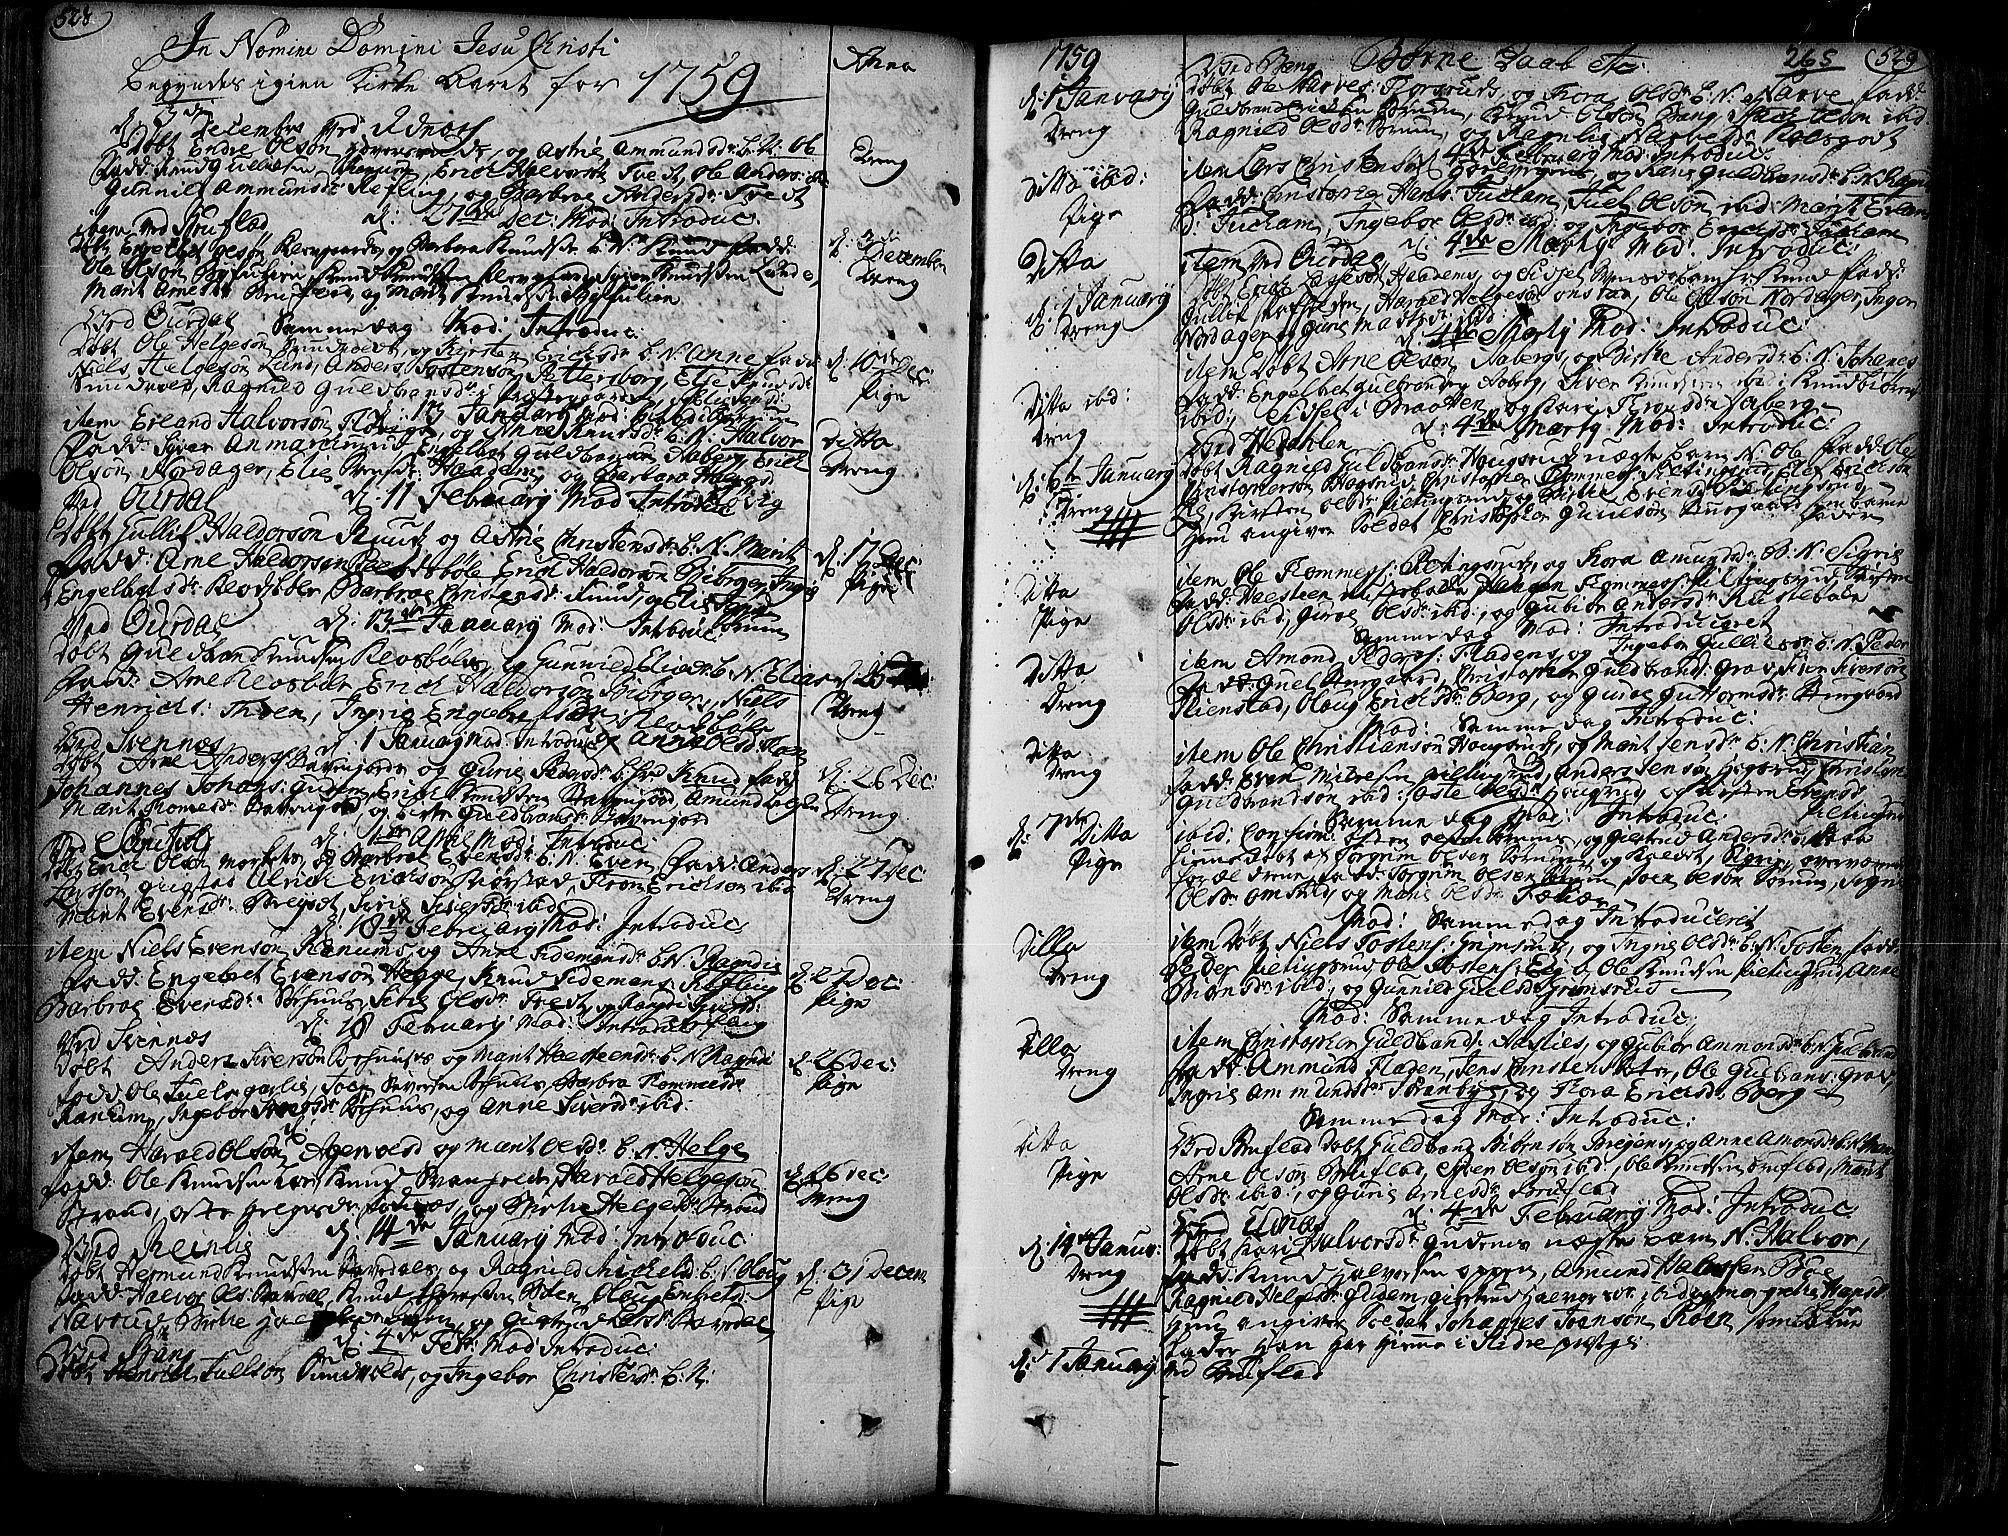 SAH, Aurdal prestekontor, Ministerialbok nr. 4, 1730-1762, s. 528-529